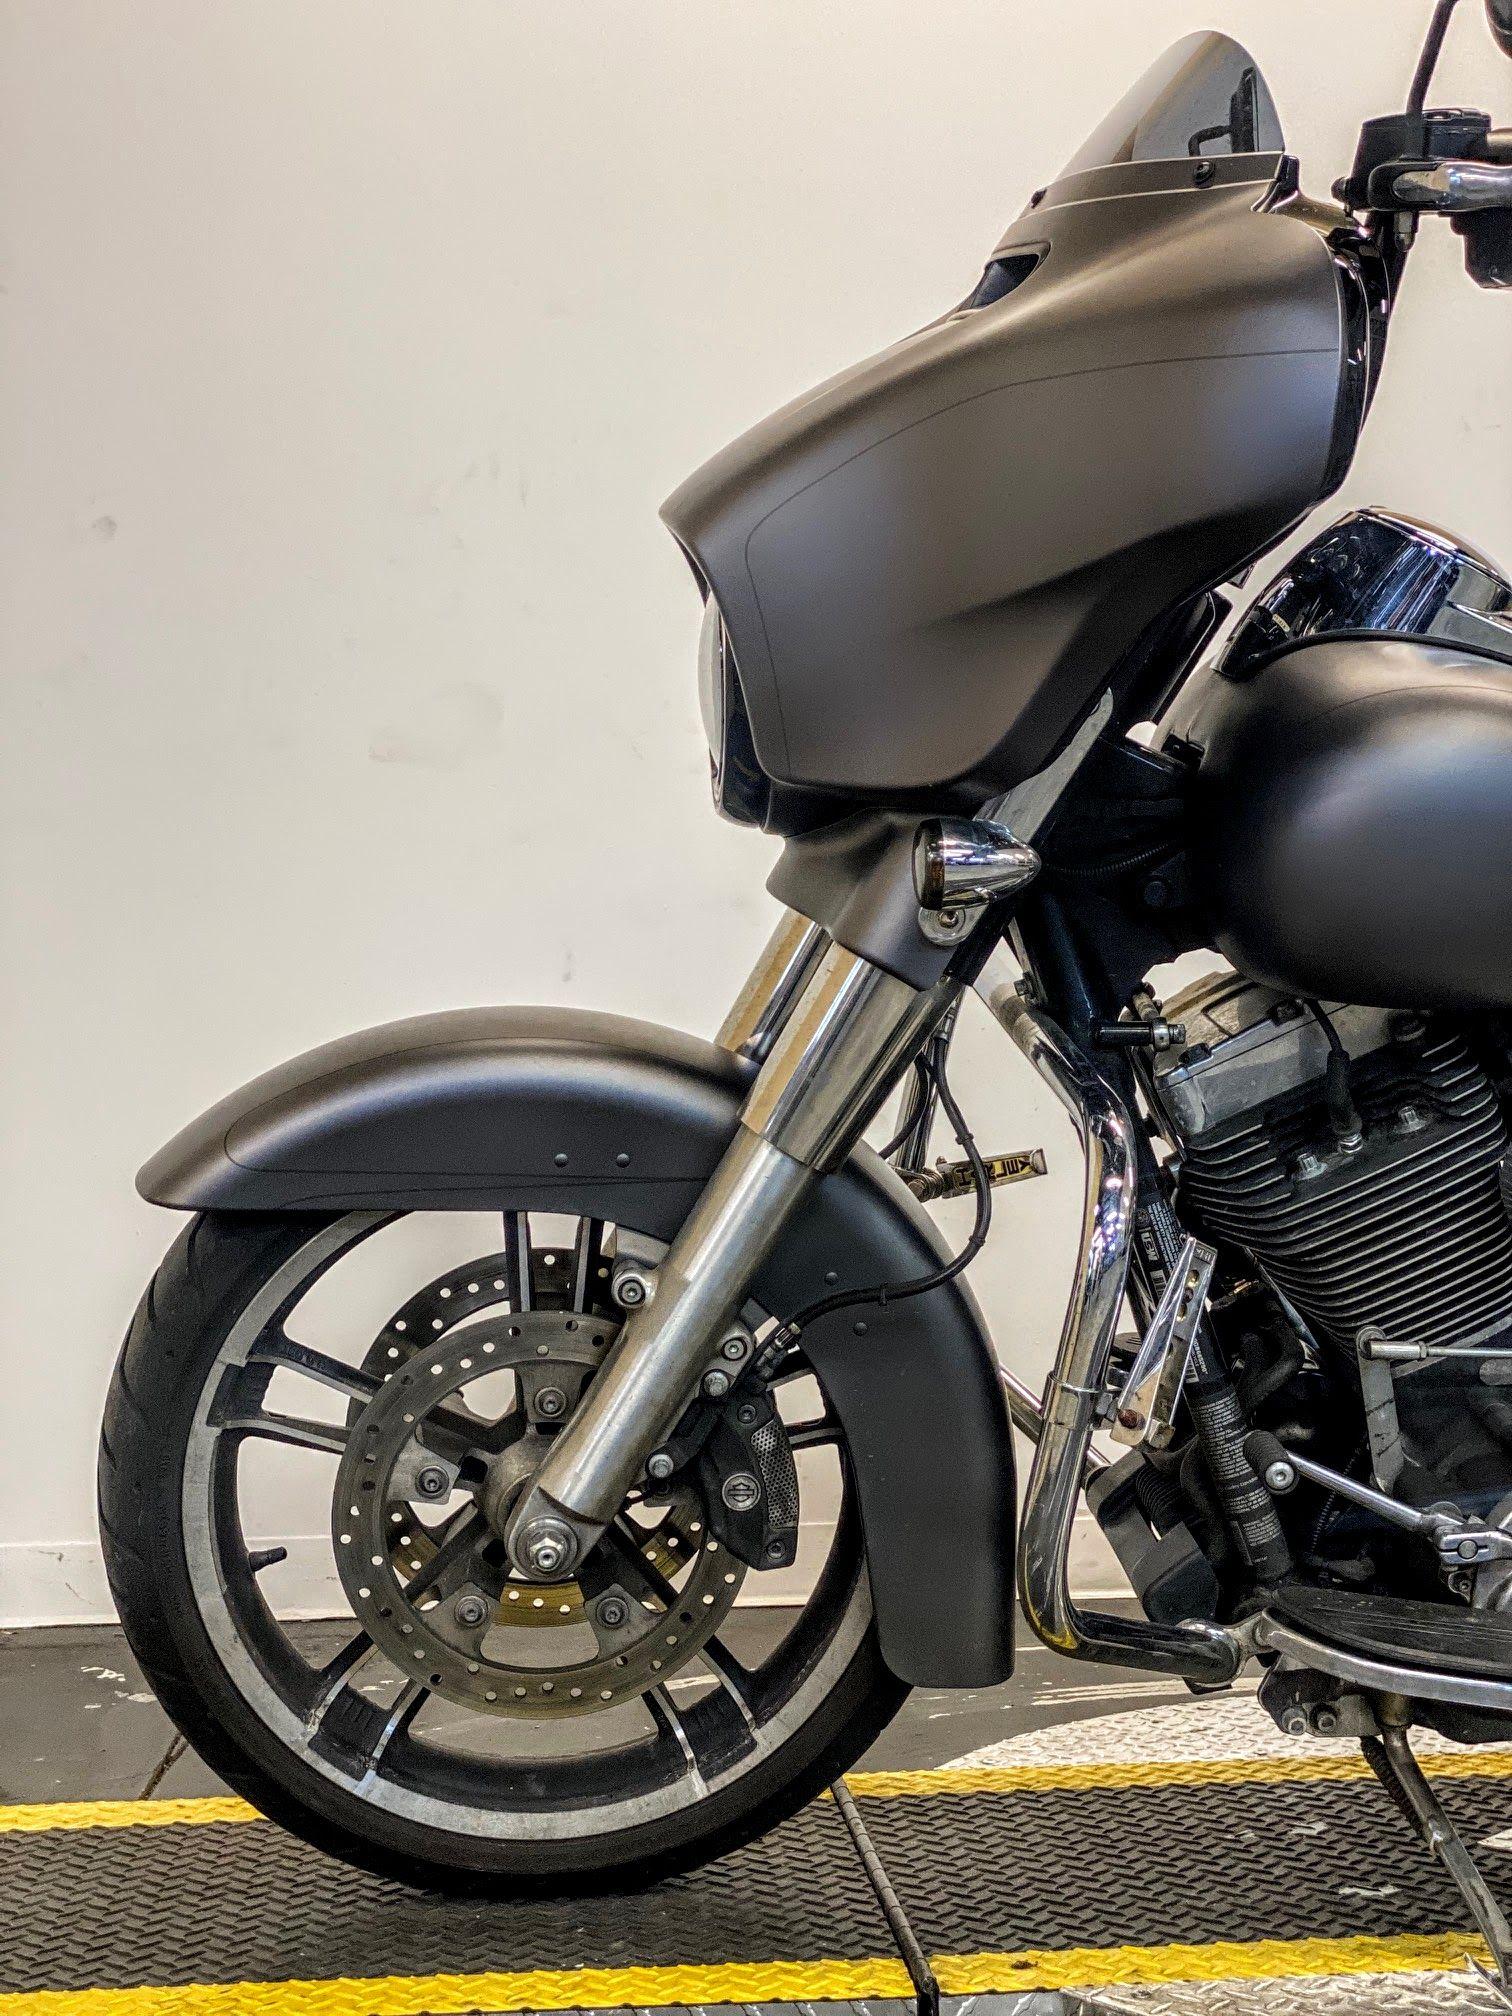 Pre-Owned 2016 Harley-Davidson Street Glide Special FLHXS